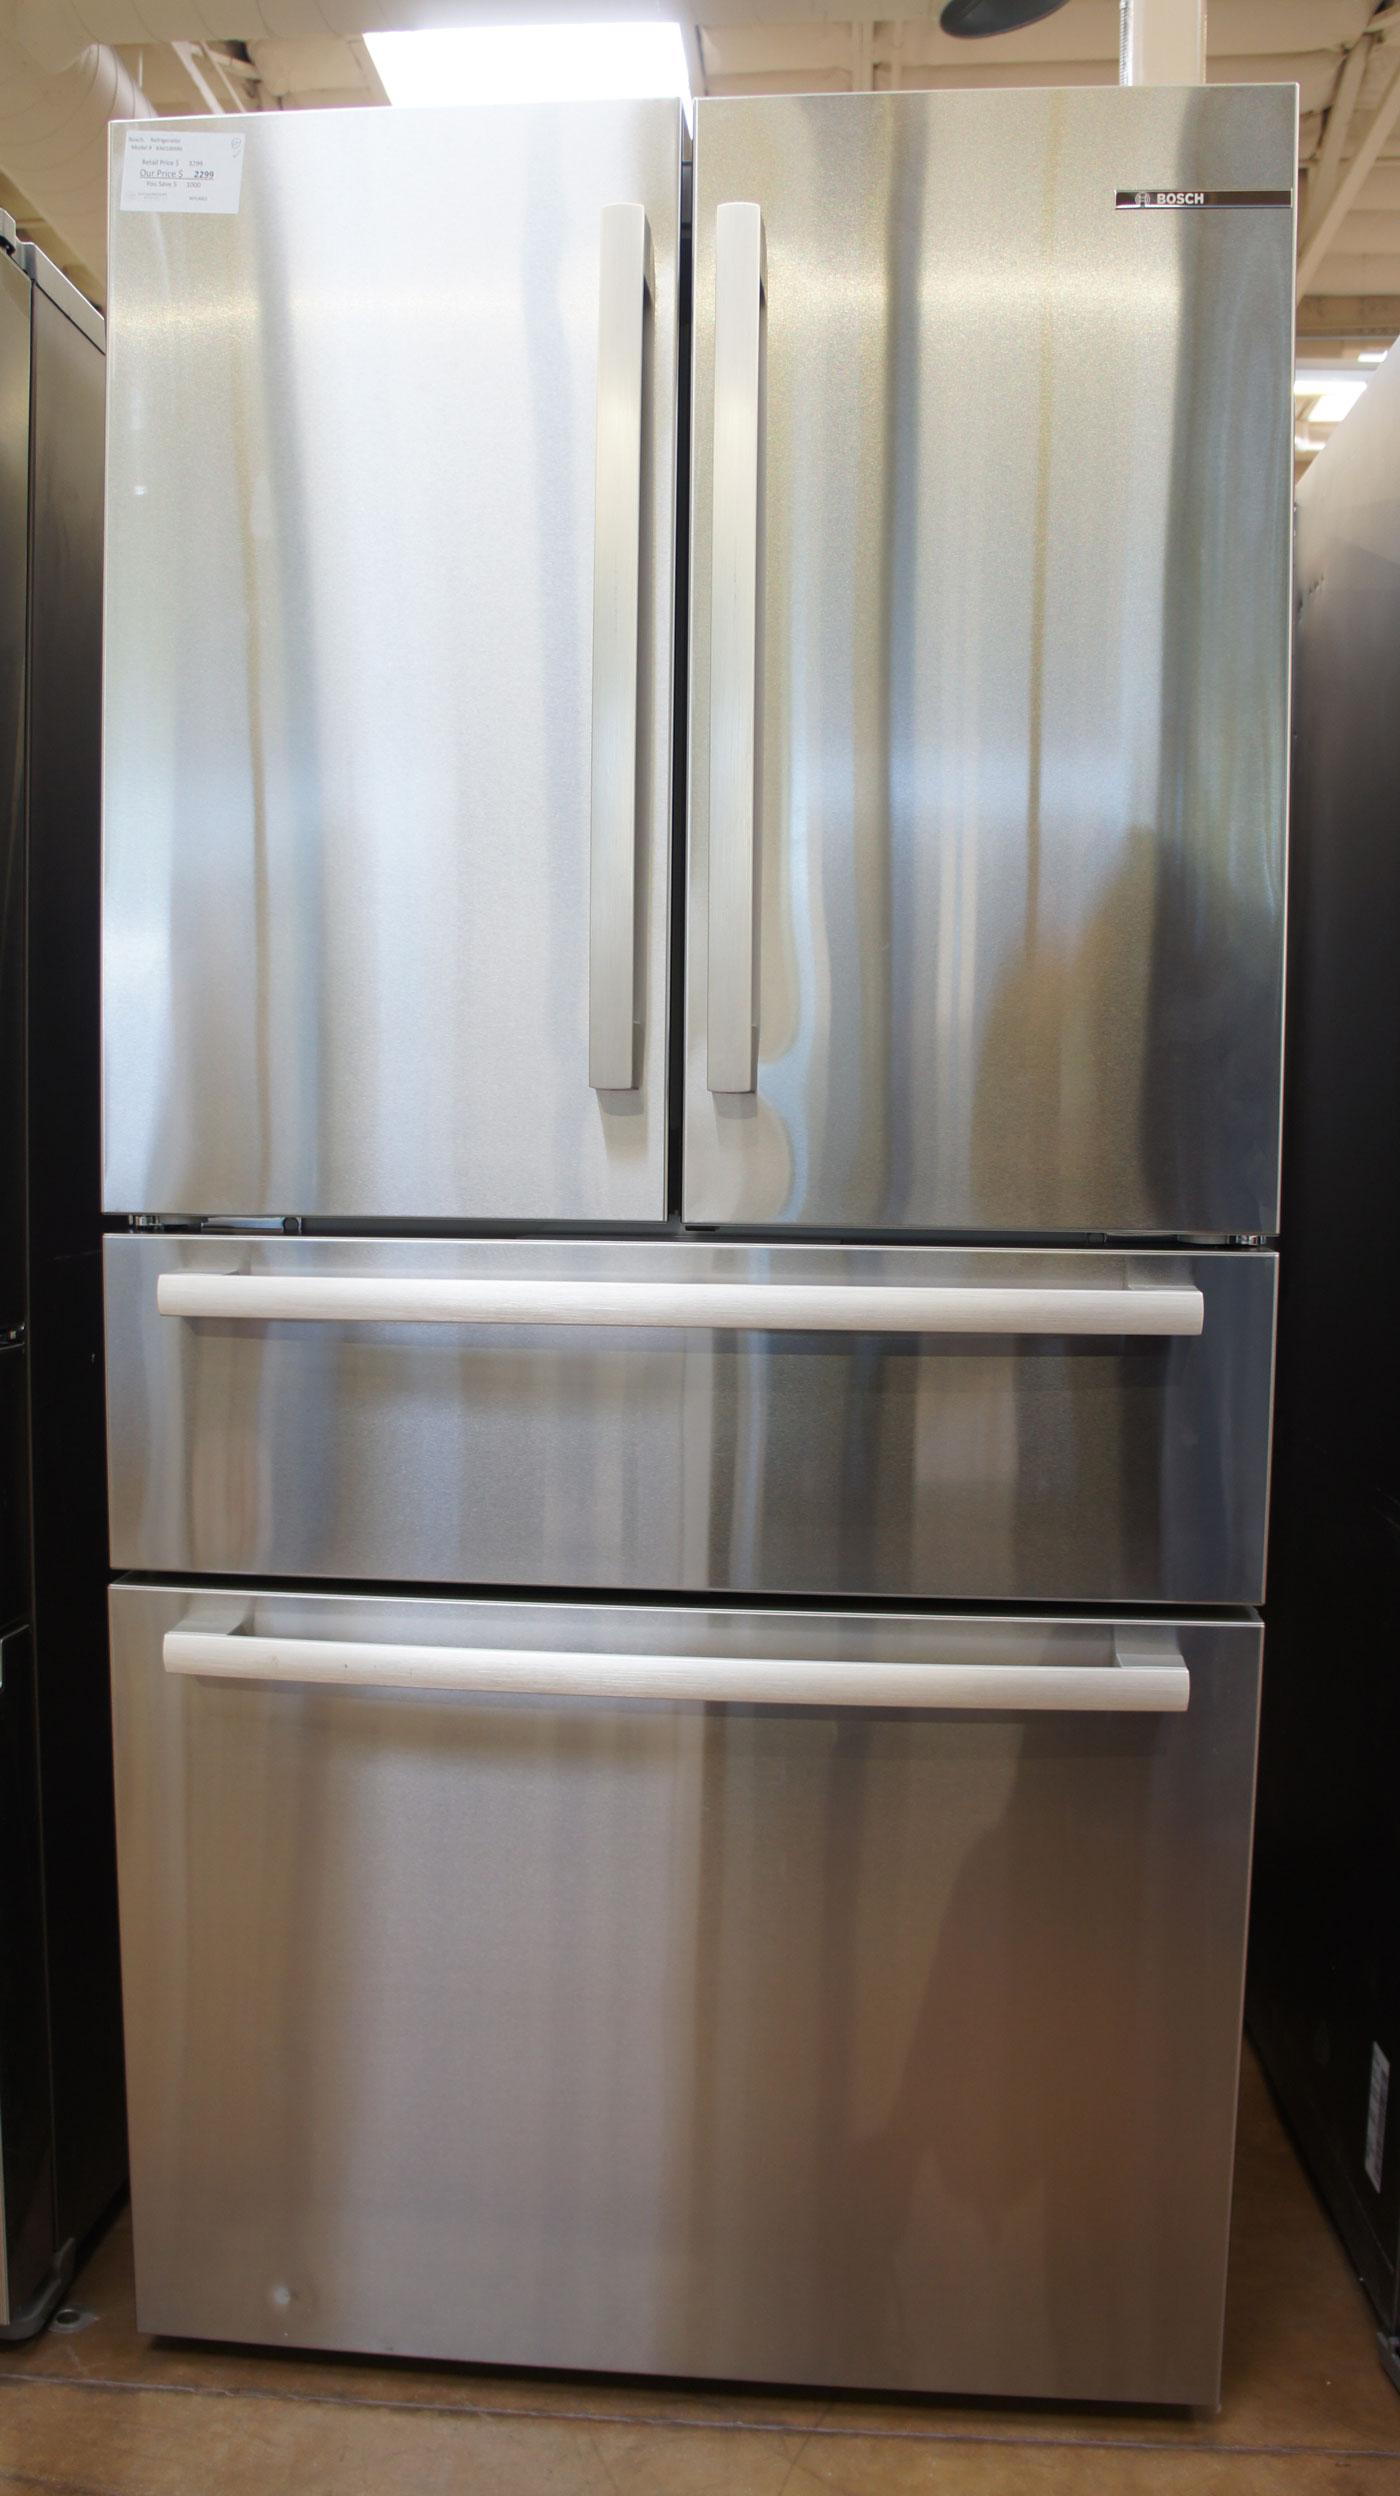 Bosch B36CL80SNS French Door Refrigerator